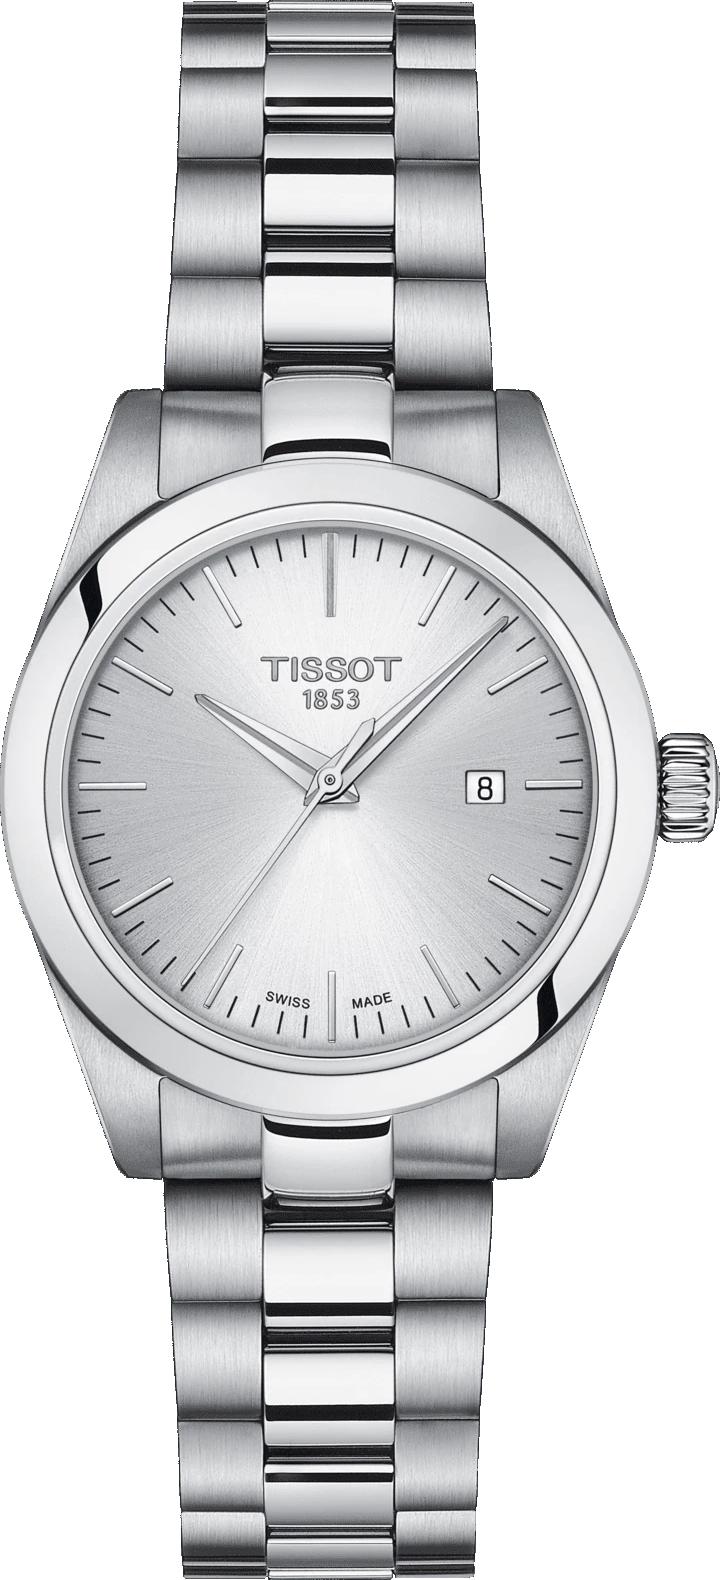 Tissot T132.010.11.031.00